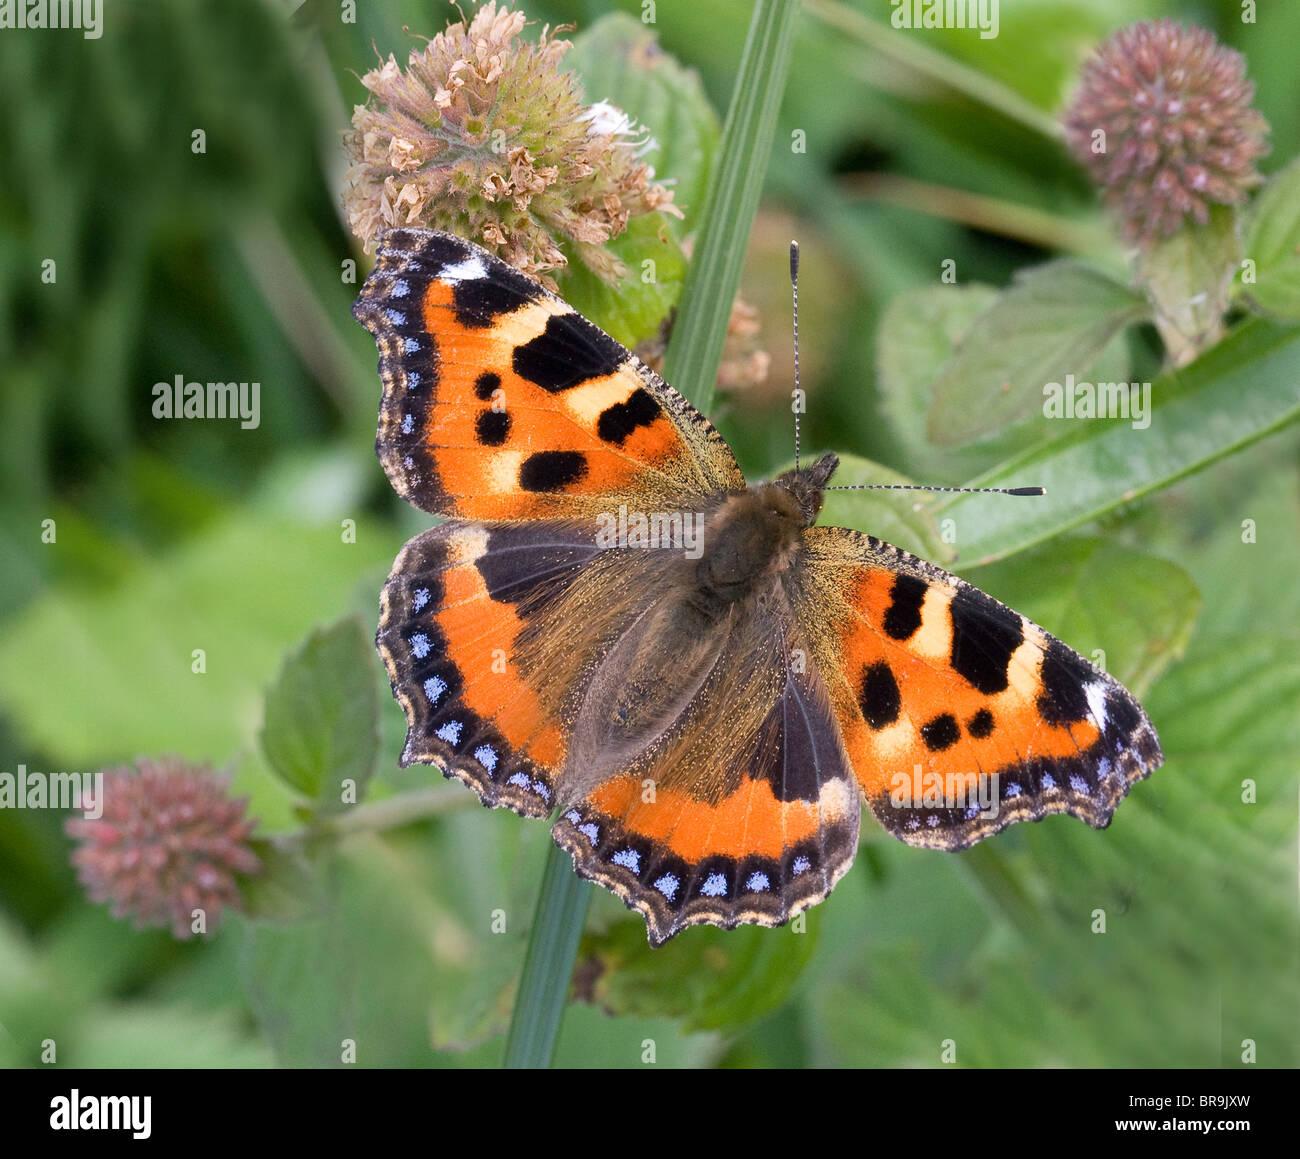 Pequeñas mariposas Tortoiseshell Aglais urticae una multa imago de la progenie de otoño en el Reino Unido alimentándose Foto de stock